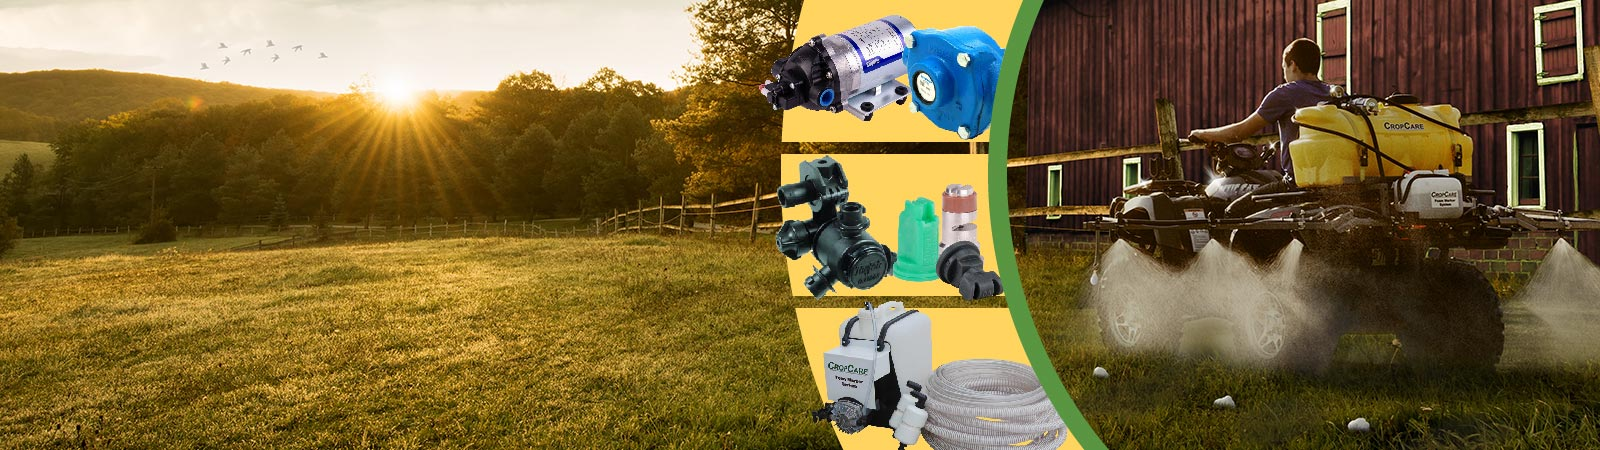 12 volt farm sprayers